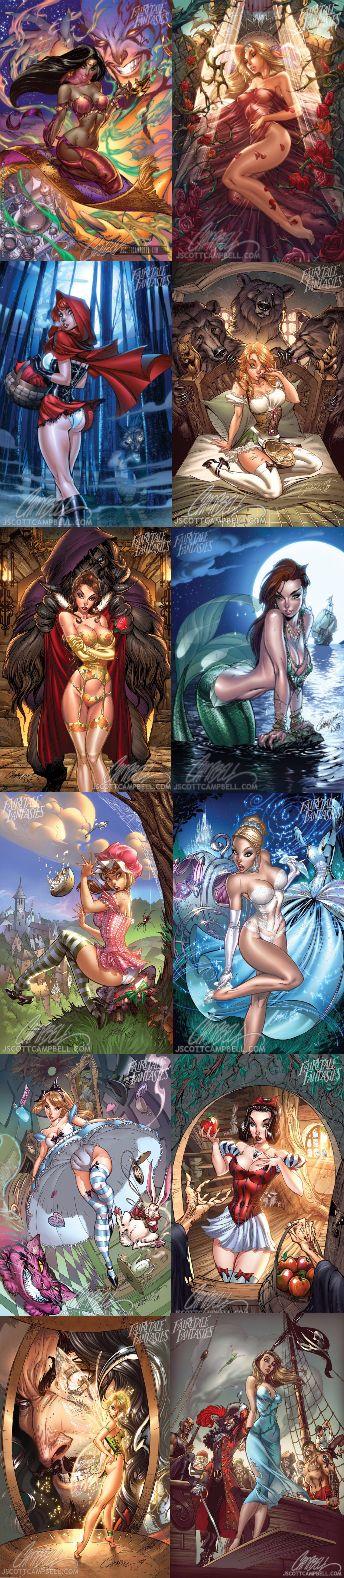 J. Scott Campbell's Fairytale Fantasies, no link :(